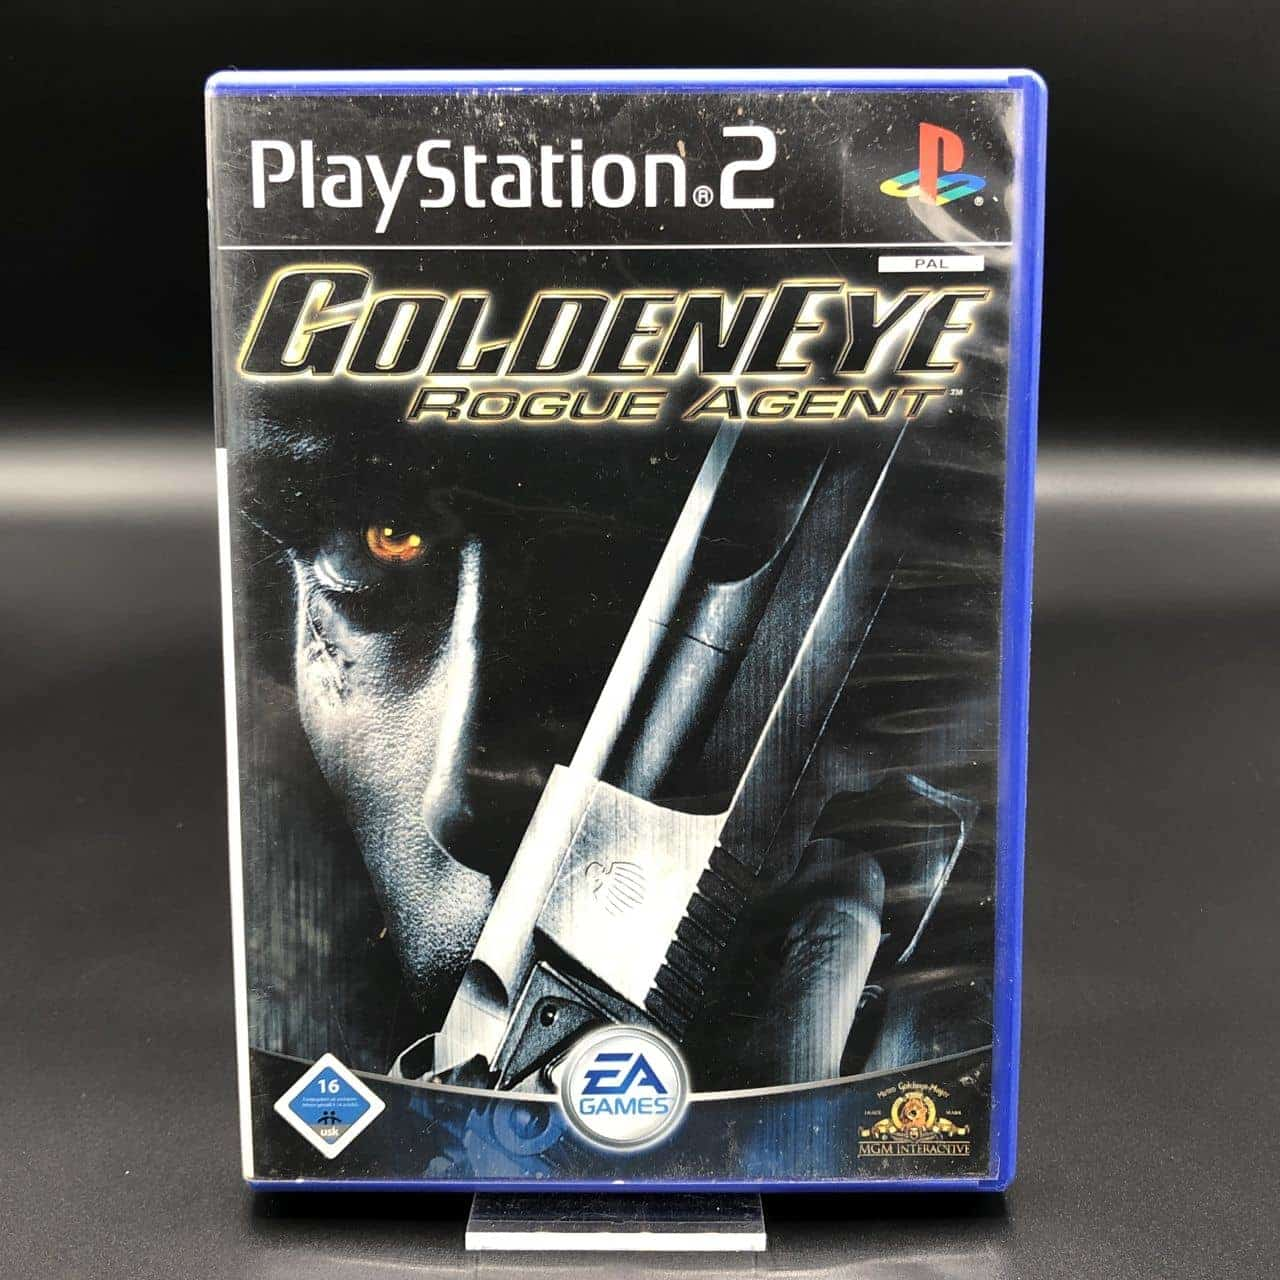 PS2 GoldenEye: Rogue Agent (Komplett) (Sehr gut) Sony PlayStation 2